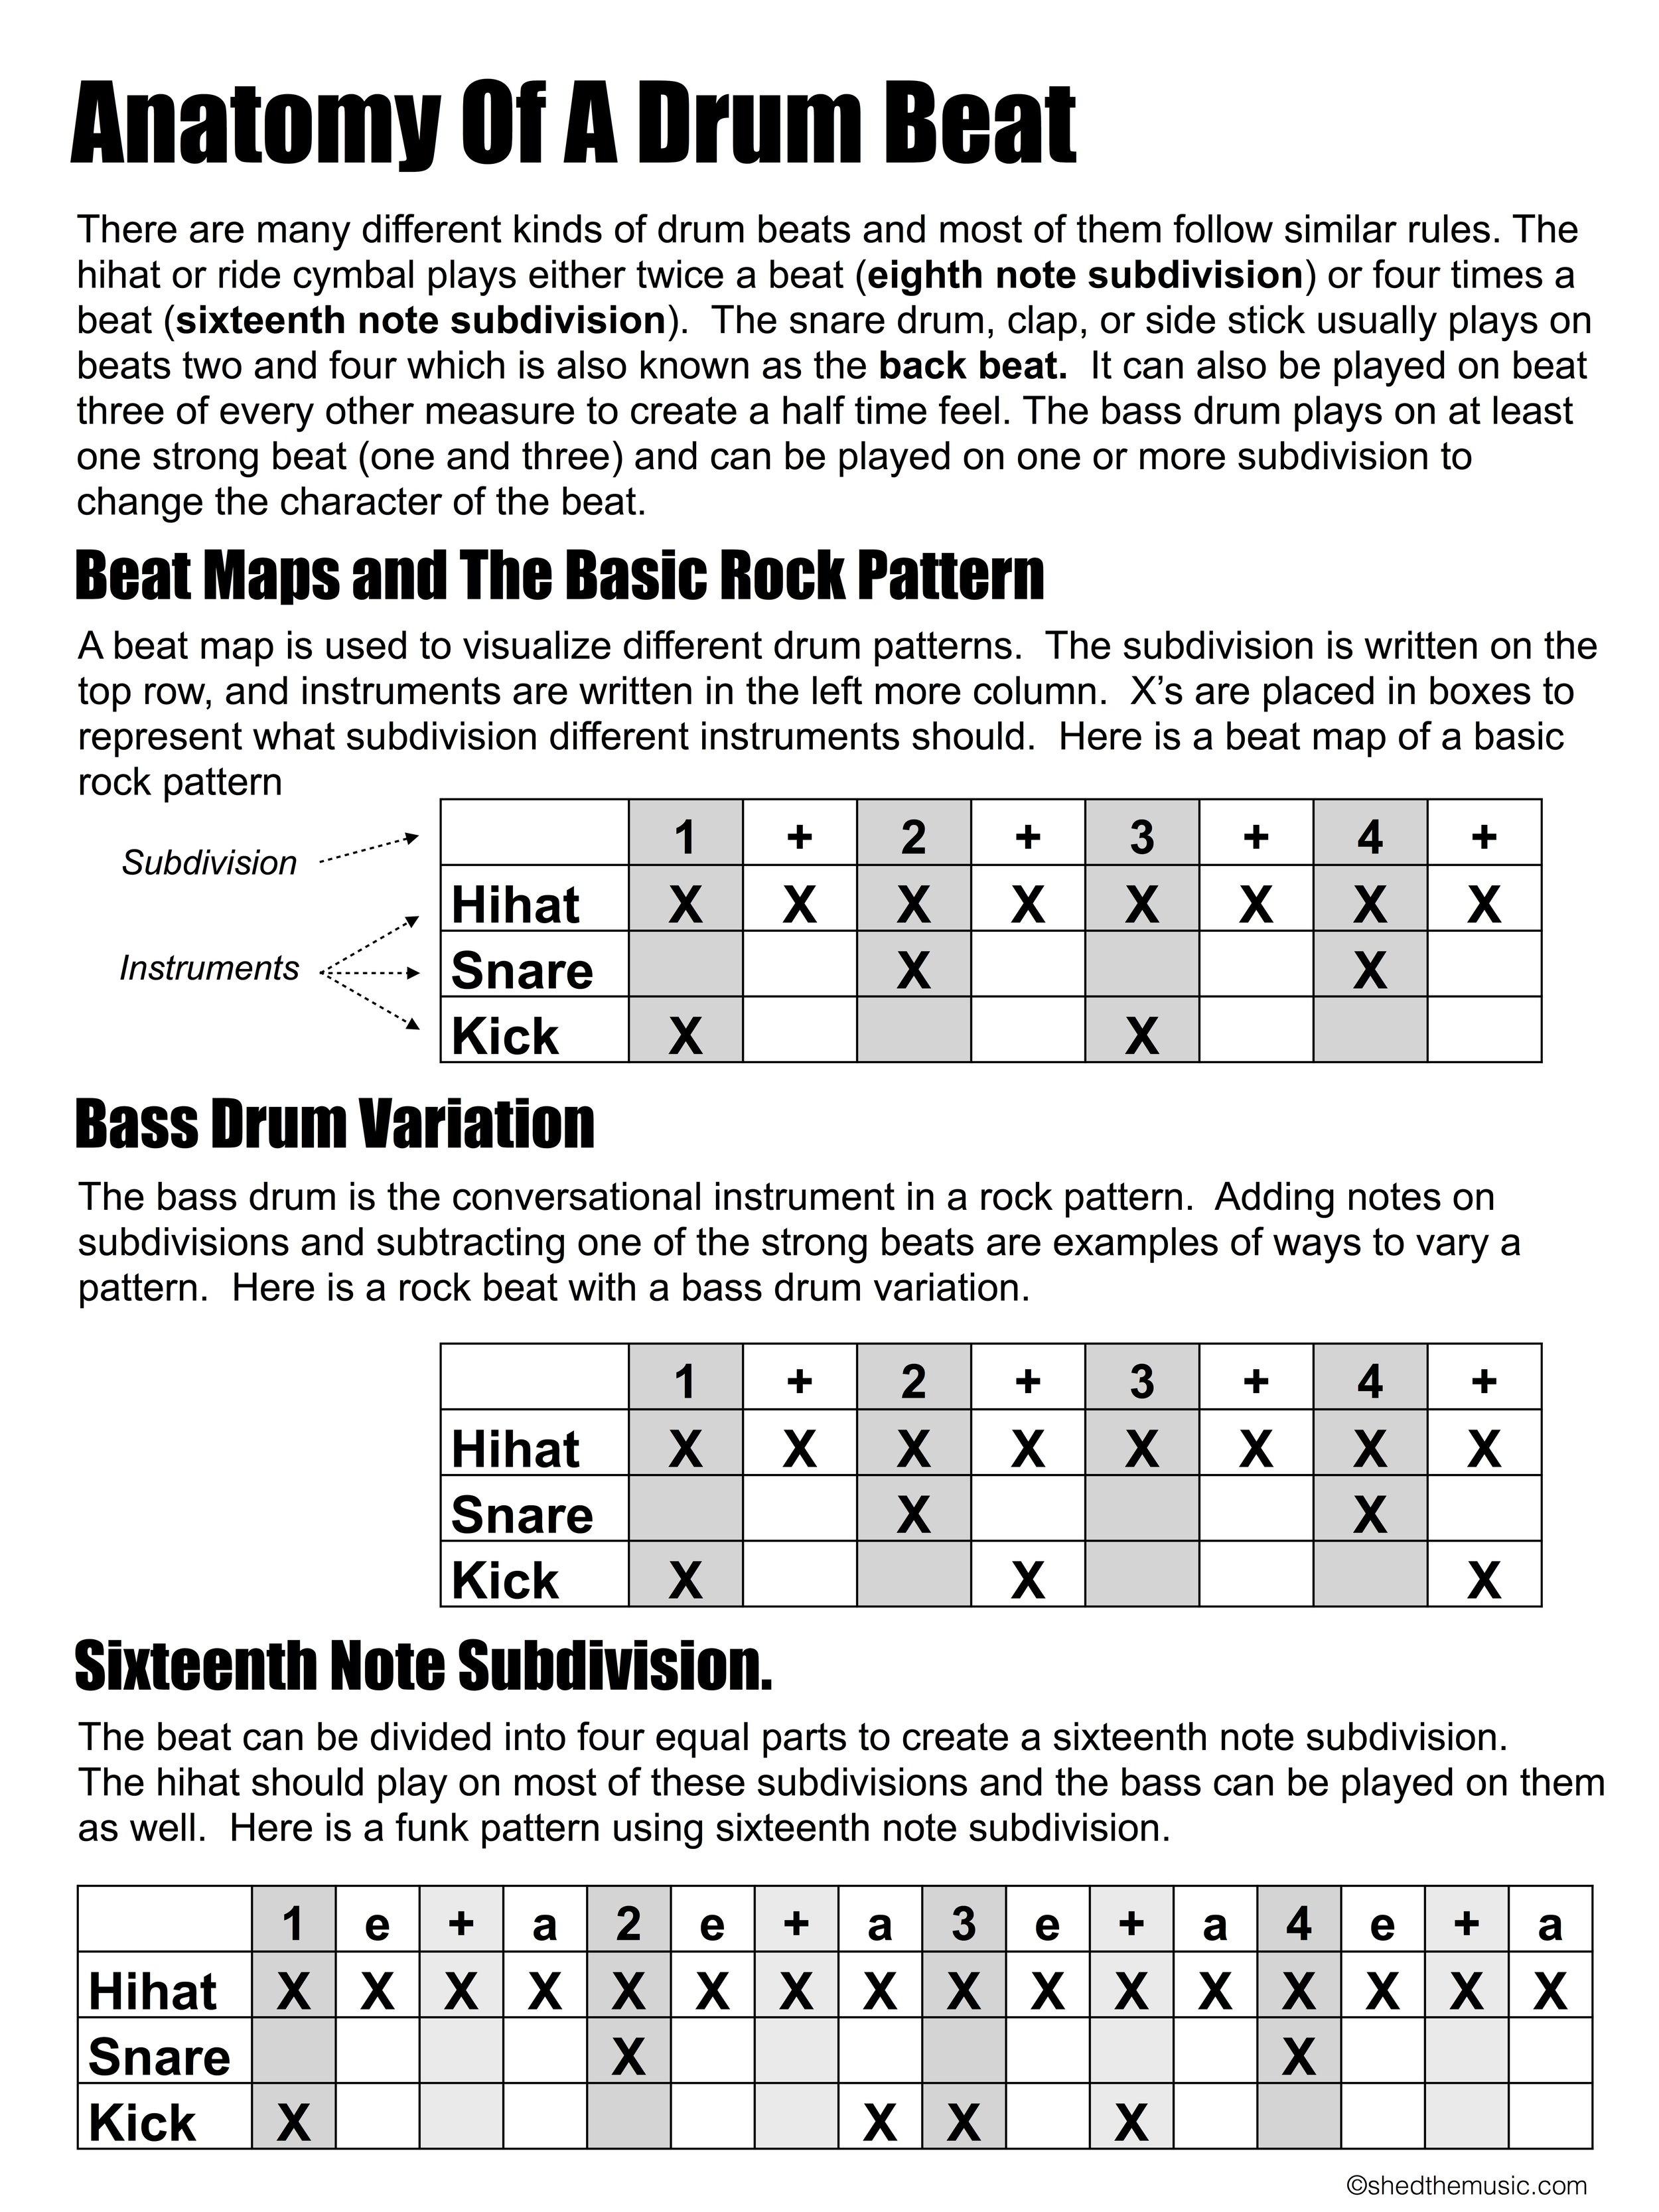 Anatomy of a drum beat.jpg